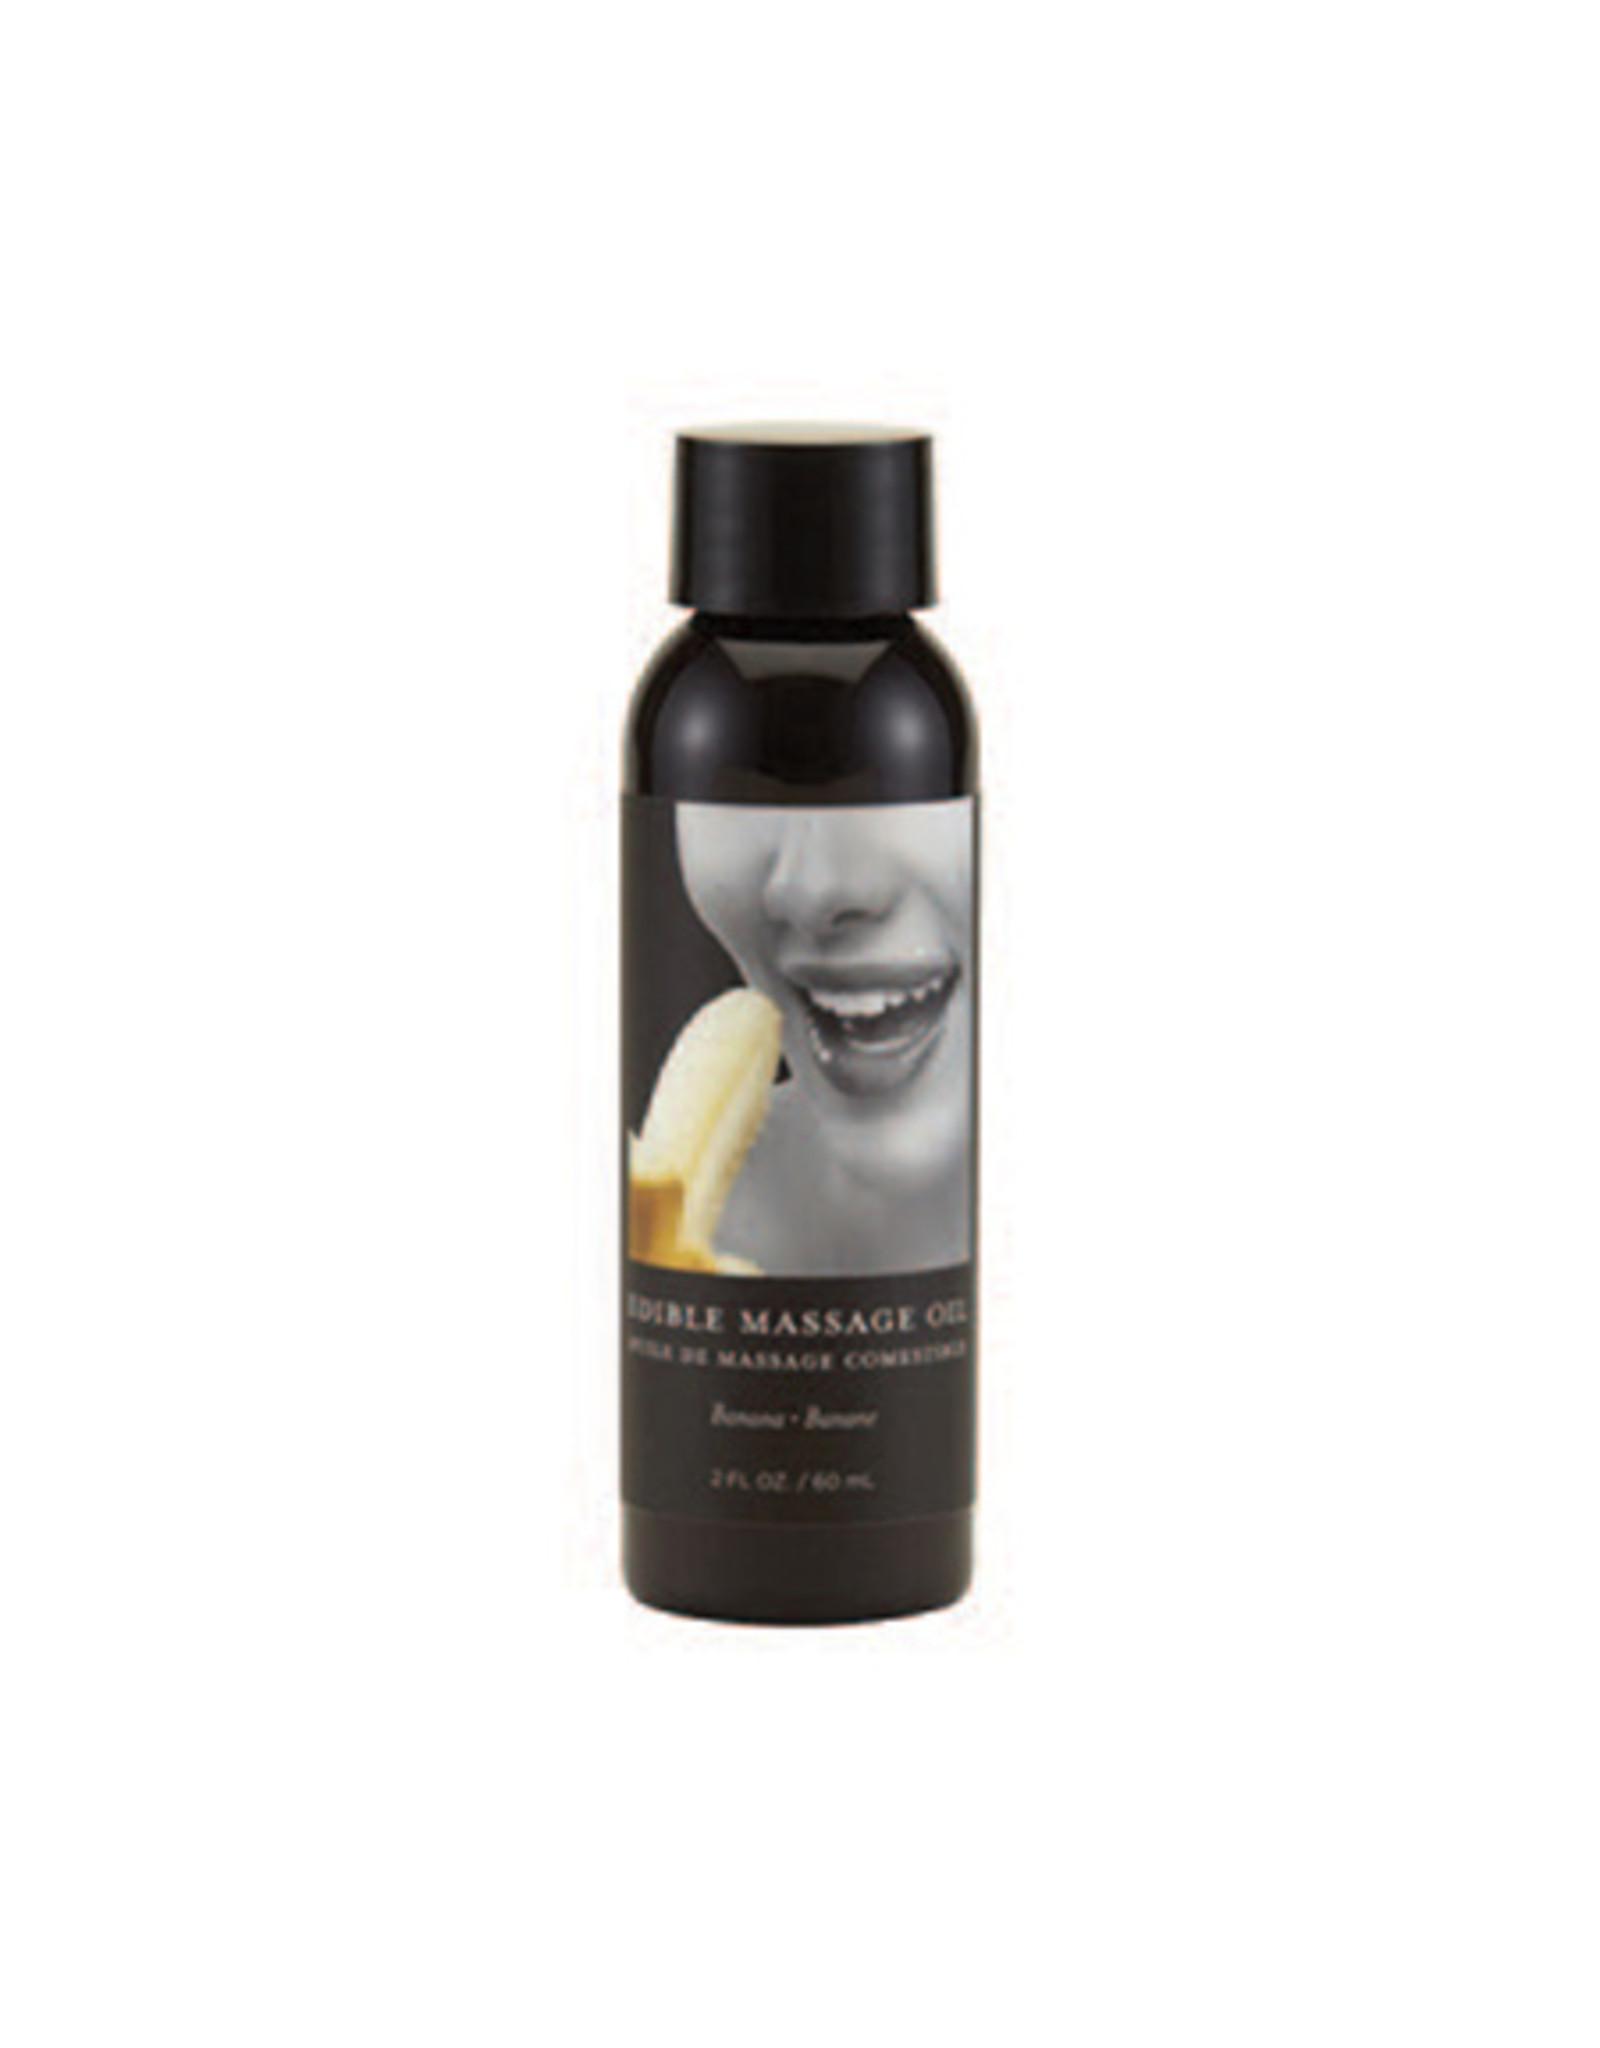 Earthly Body Edible Massage Oil Banana